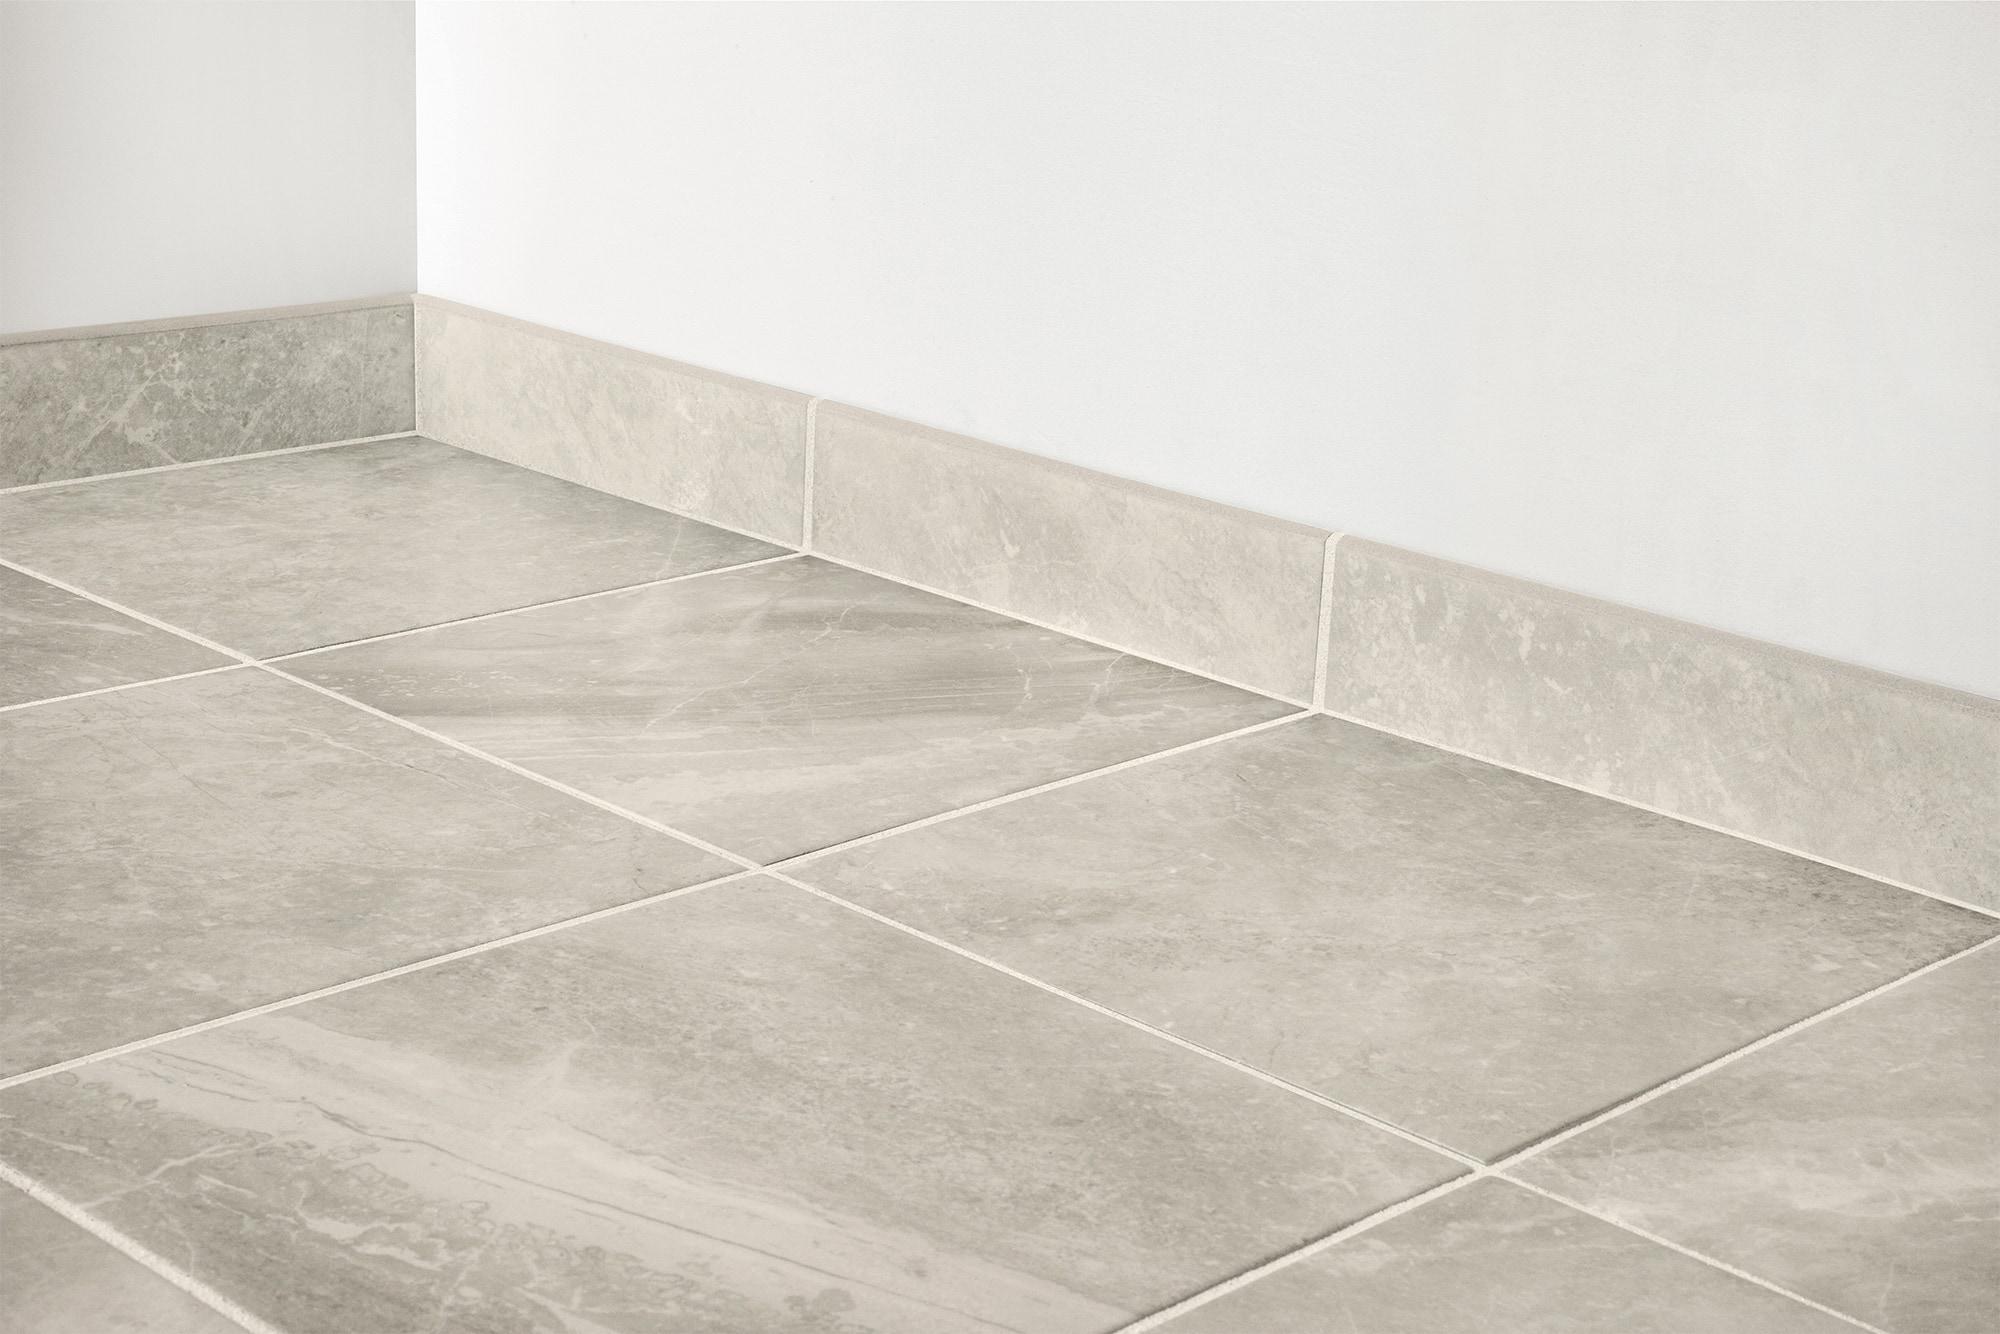 Amber / 3x12 - Bullnose / Matte Porcelain Tile - Desire Series 0